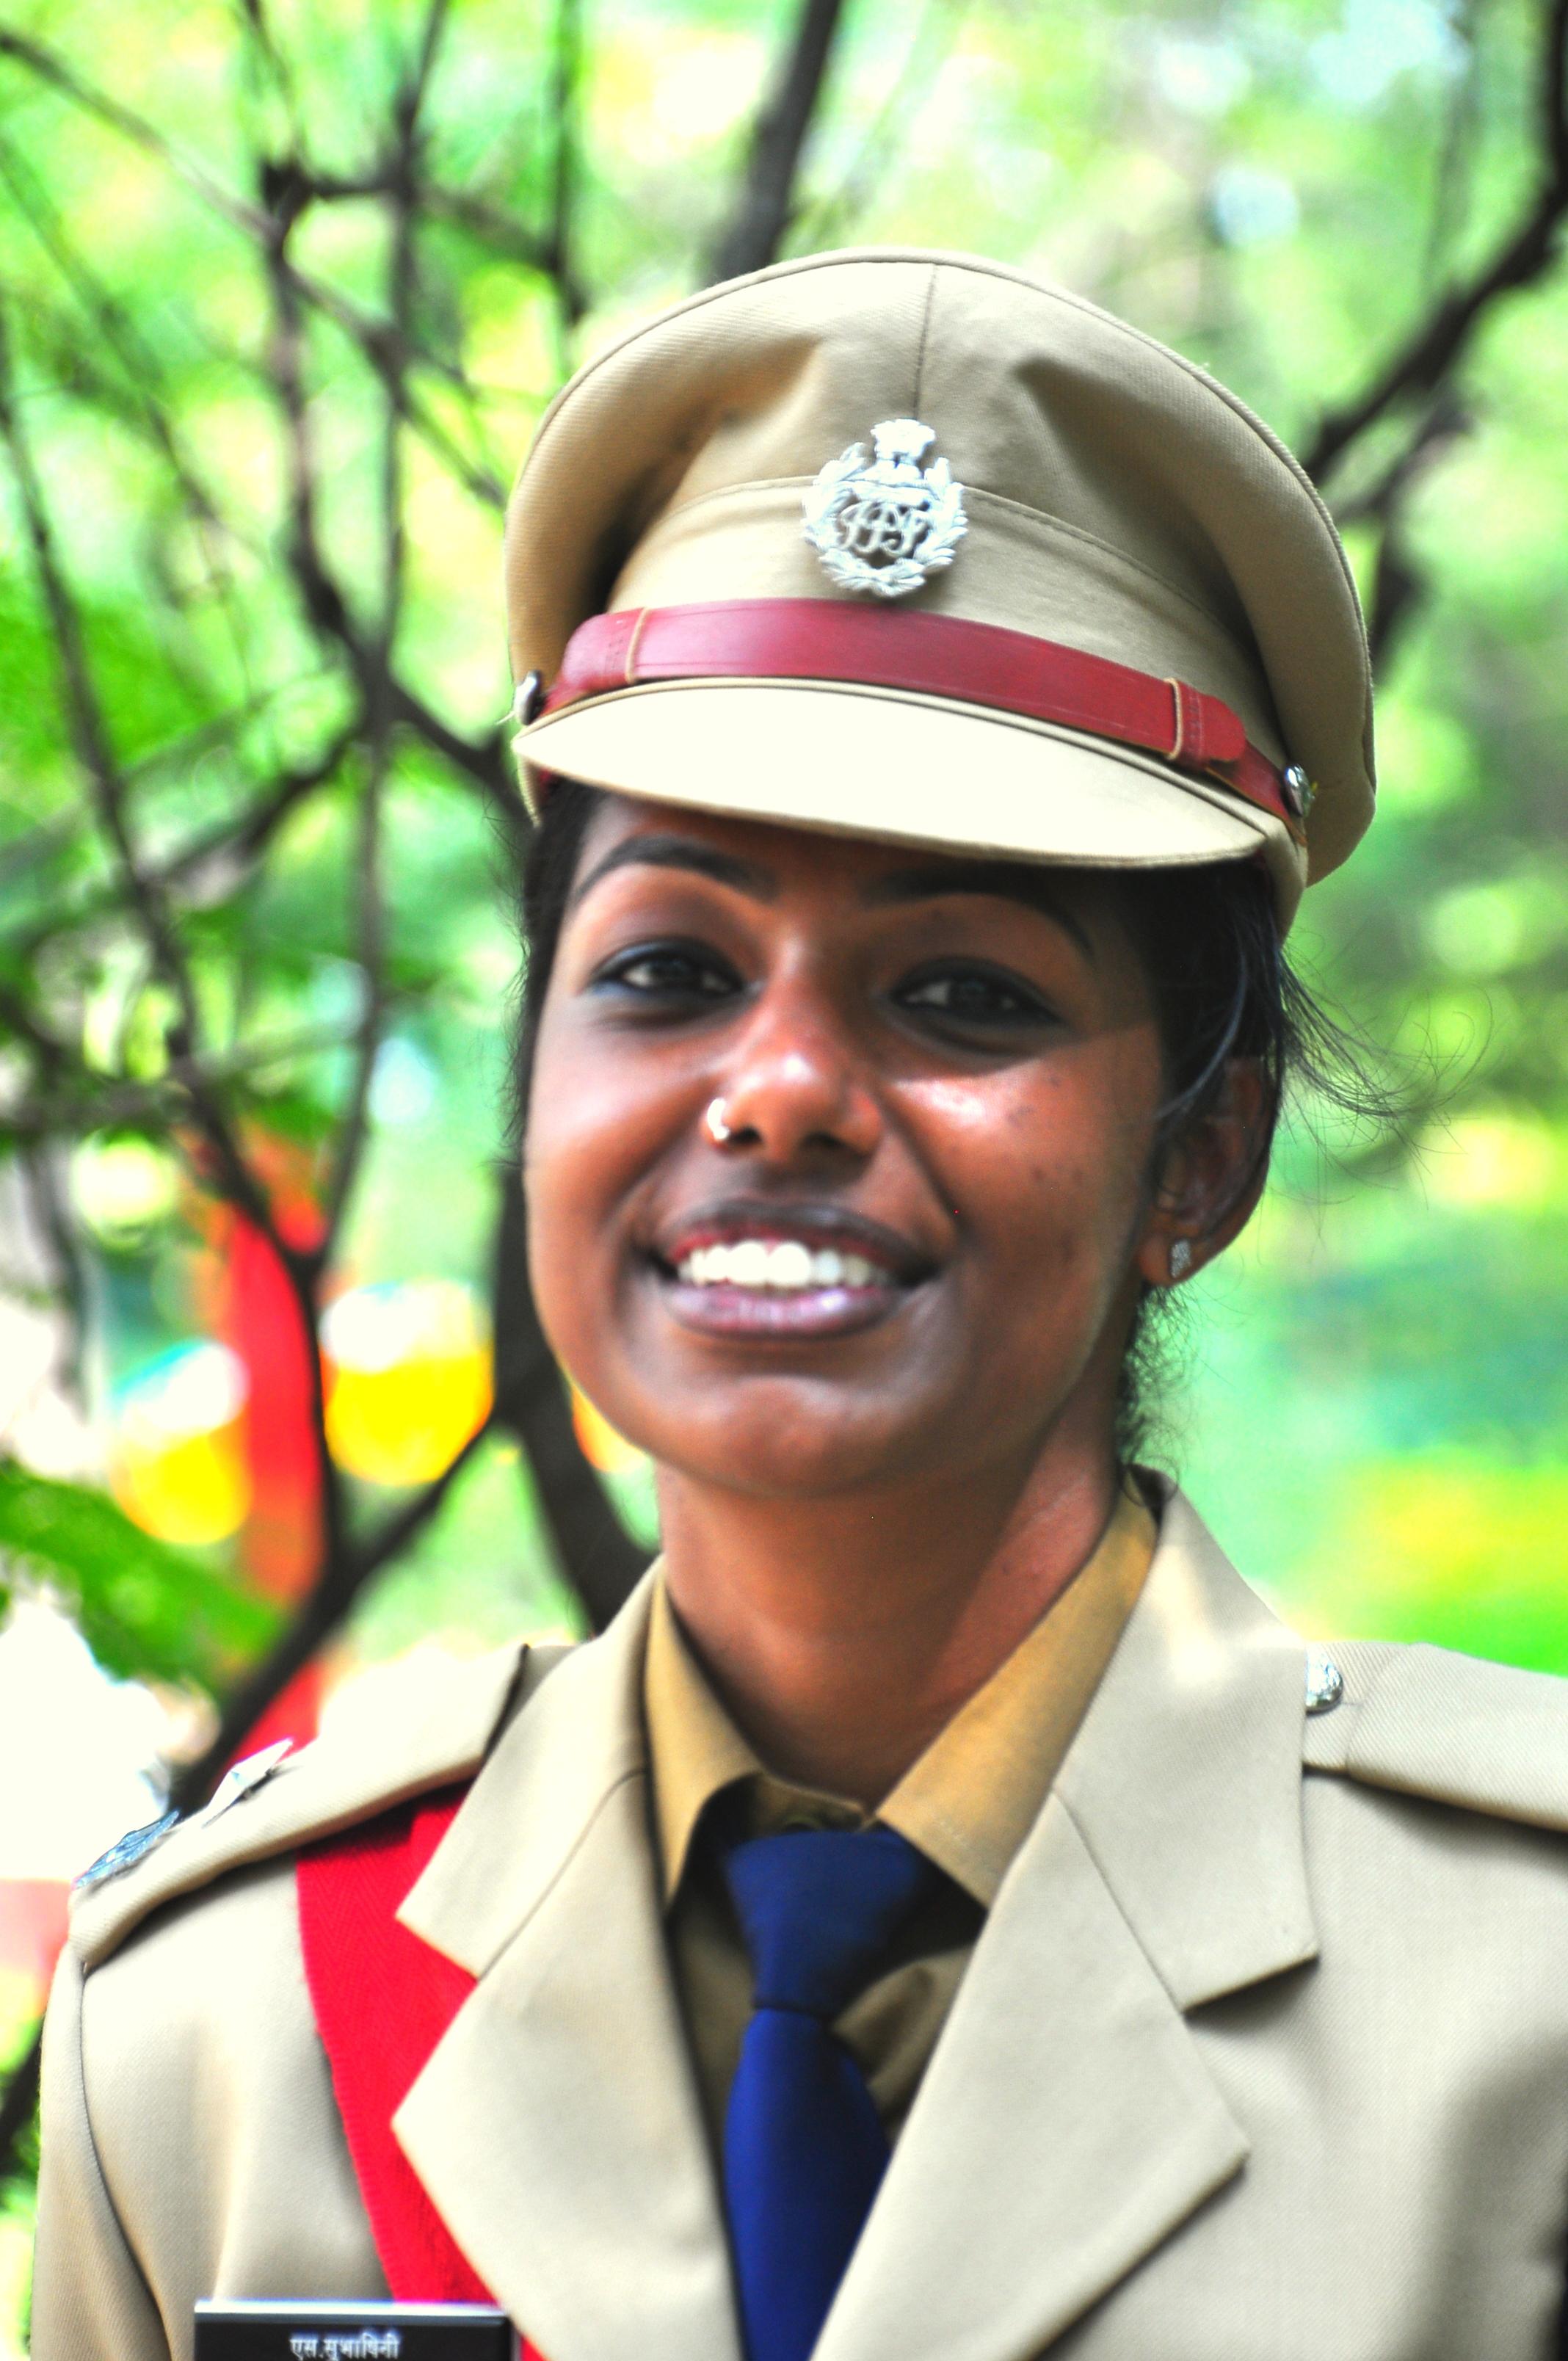 Tamilnadu police officers photos